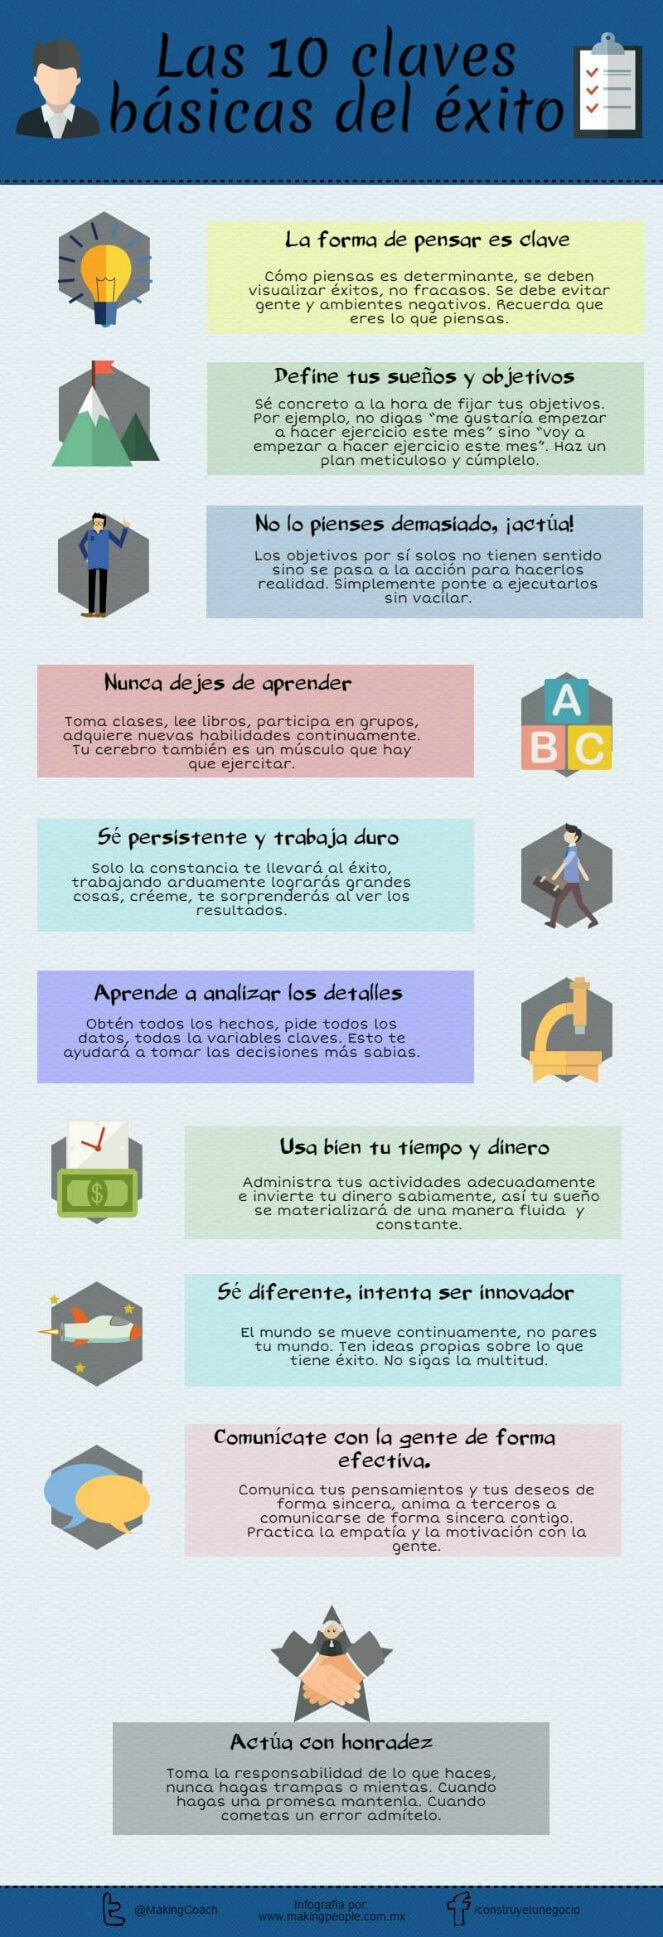 Infografia 10 claves basicas para el exito